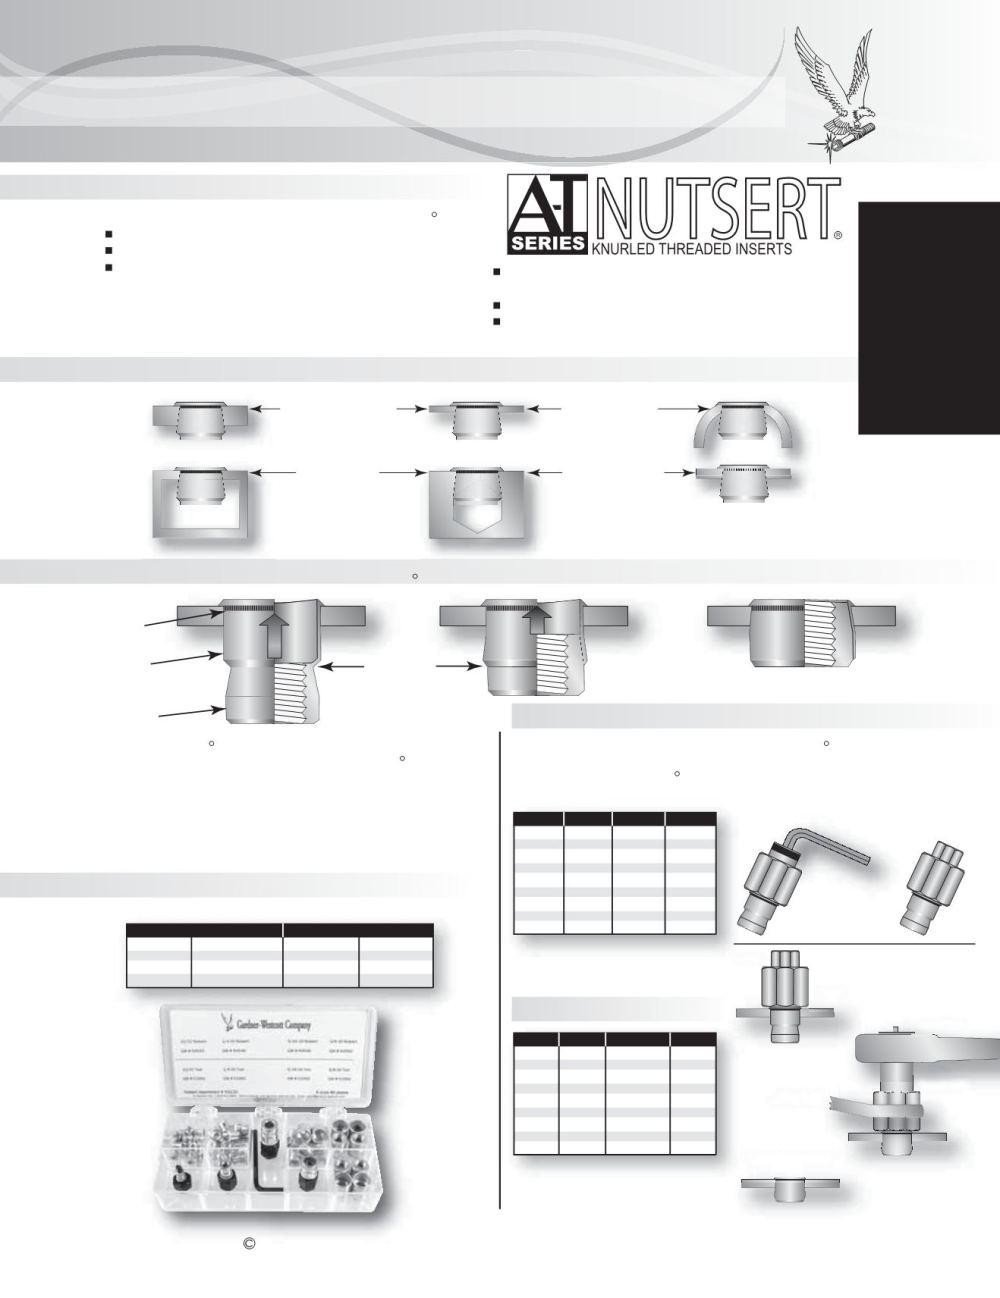 medium resolution of gardner westcott company page 109 109 electrical andnutserts handymanstyleassortmentwithtools